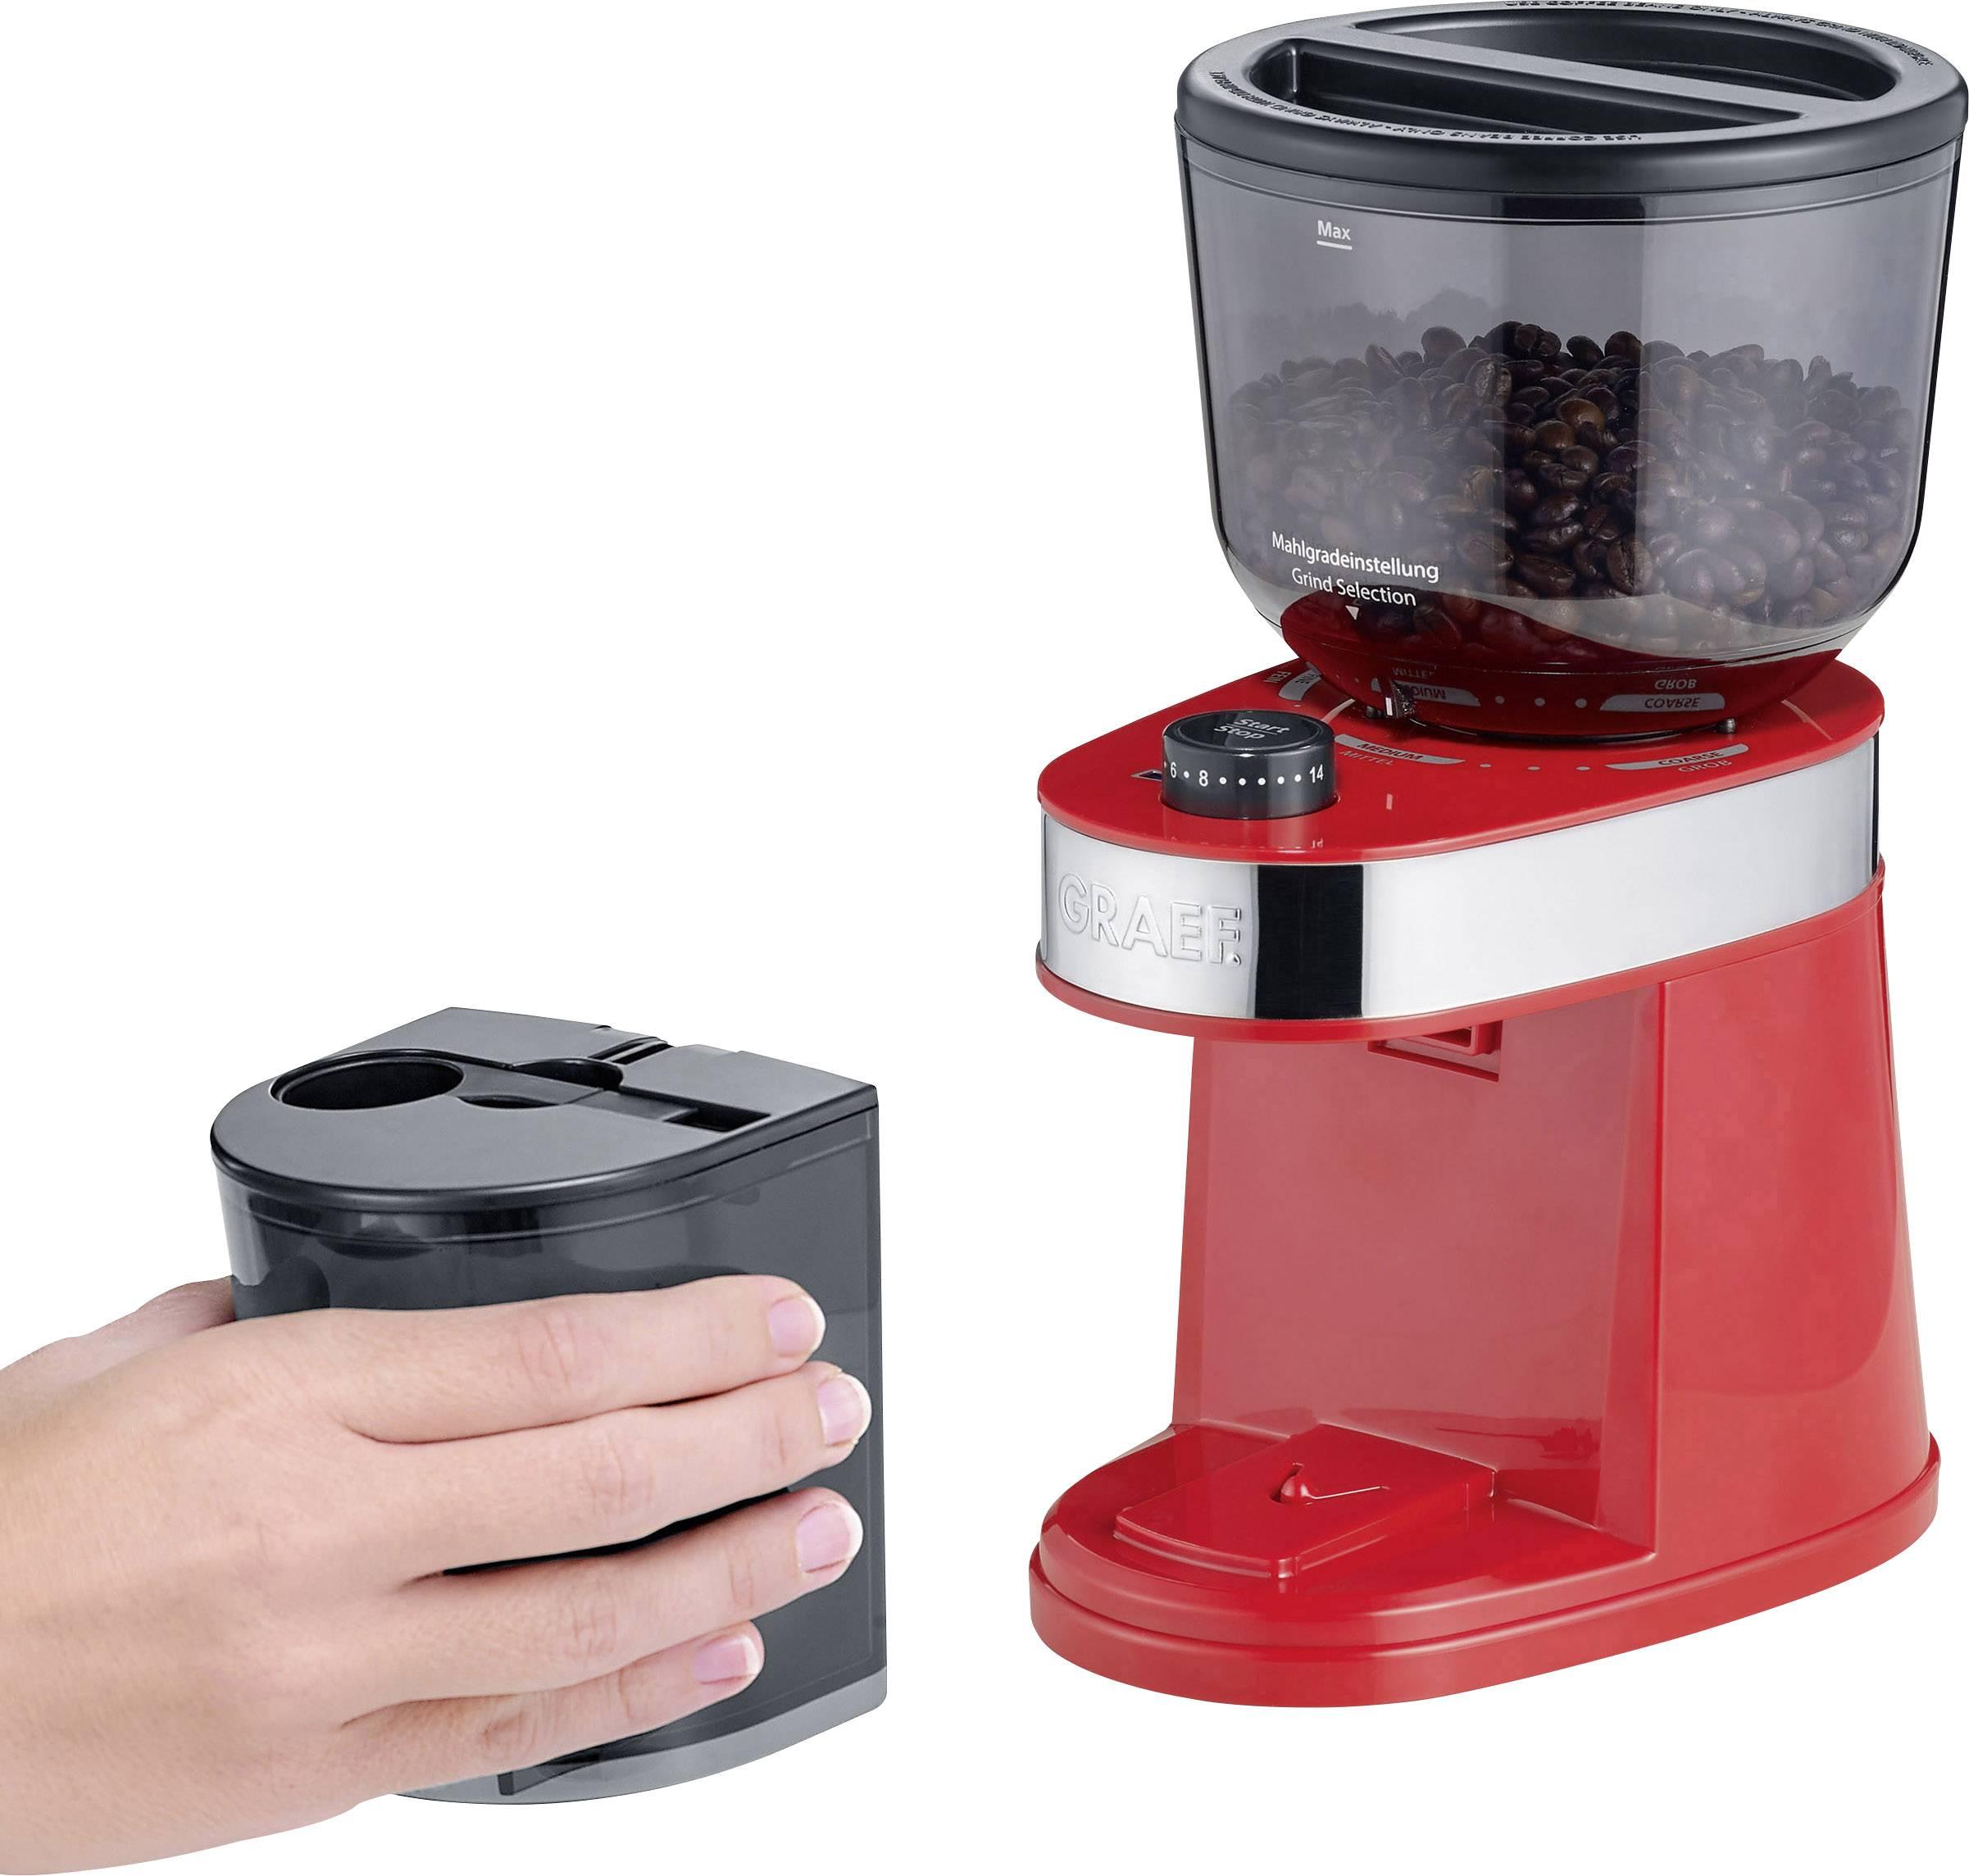 Graef CM203EU CM203EU mlinček za kavo rdeča nerjaveči mlinček s ploščatim rezilom